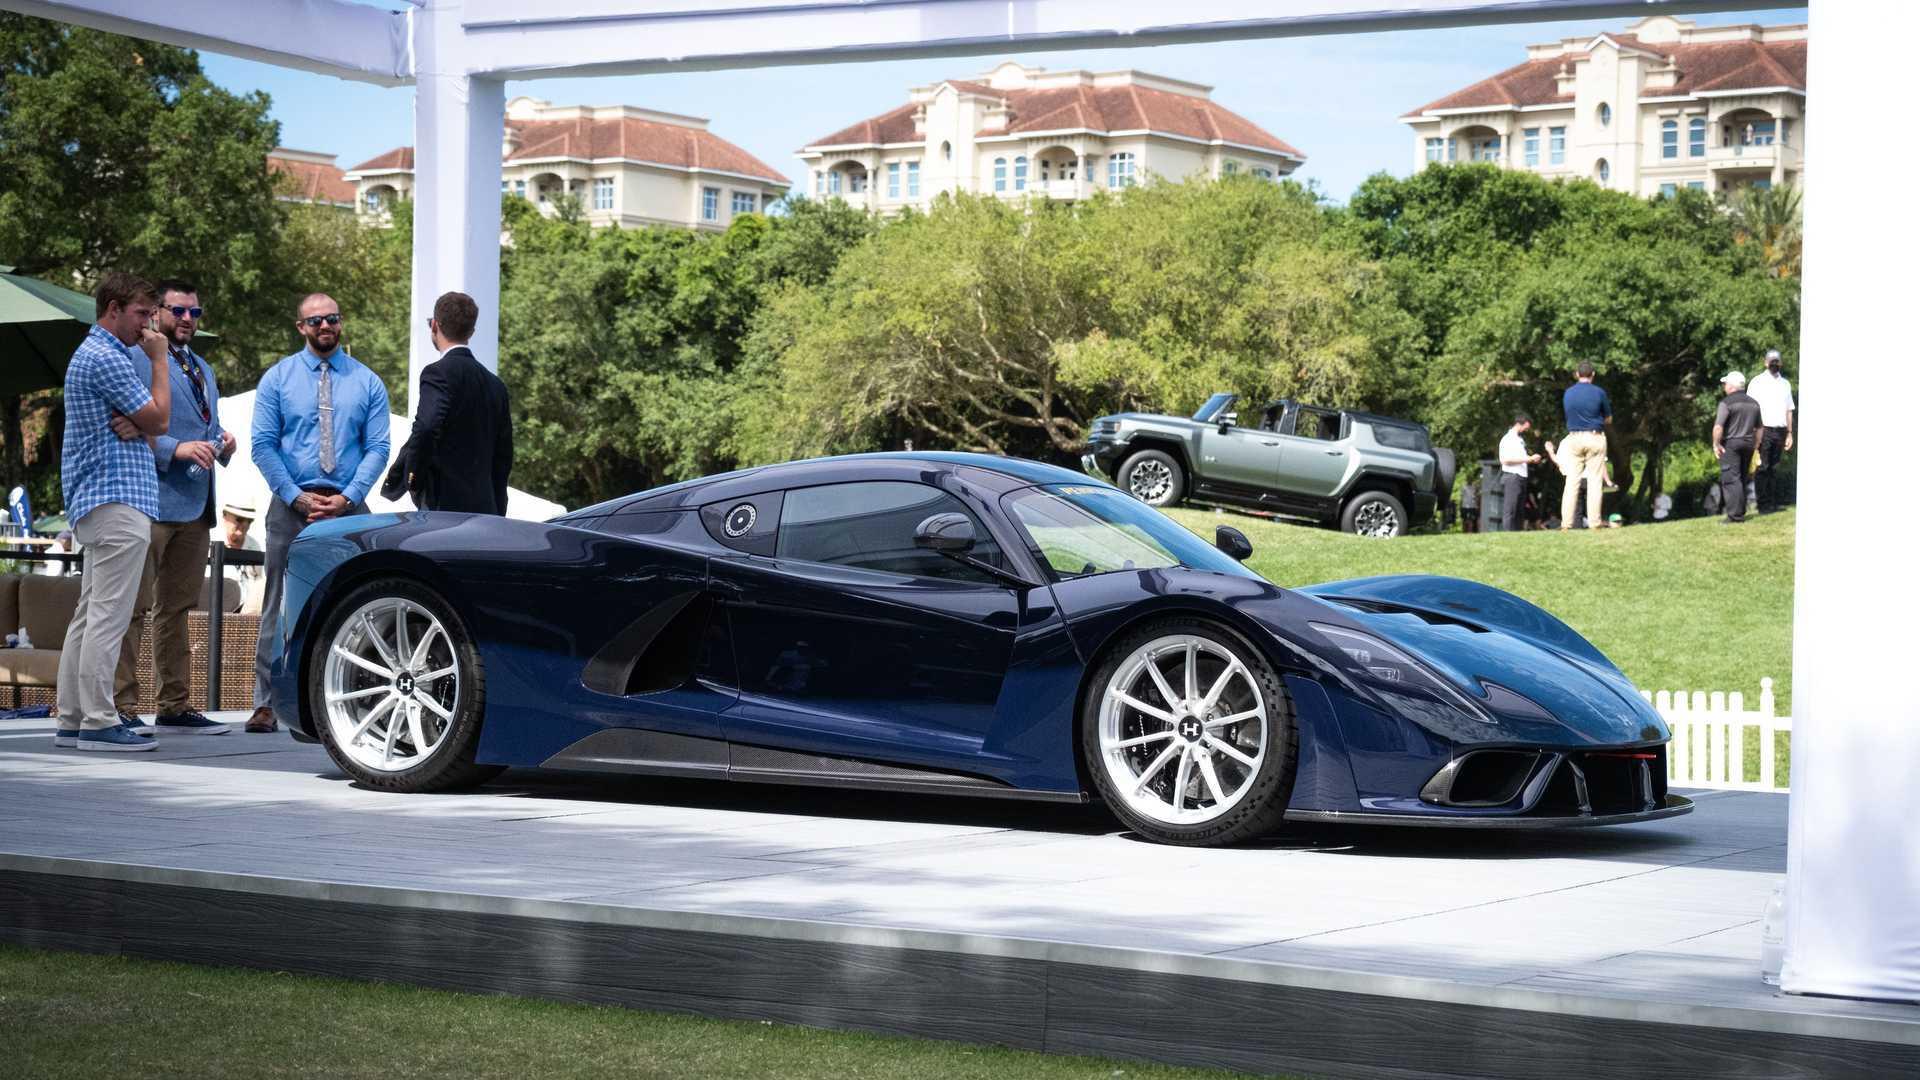 2021 Hennessey Venom F5 At Amelia Island Concours d'Elegance